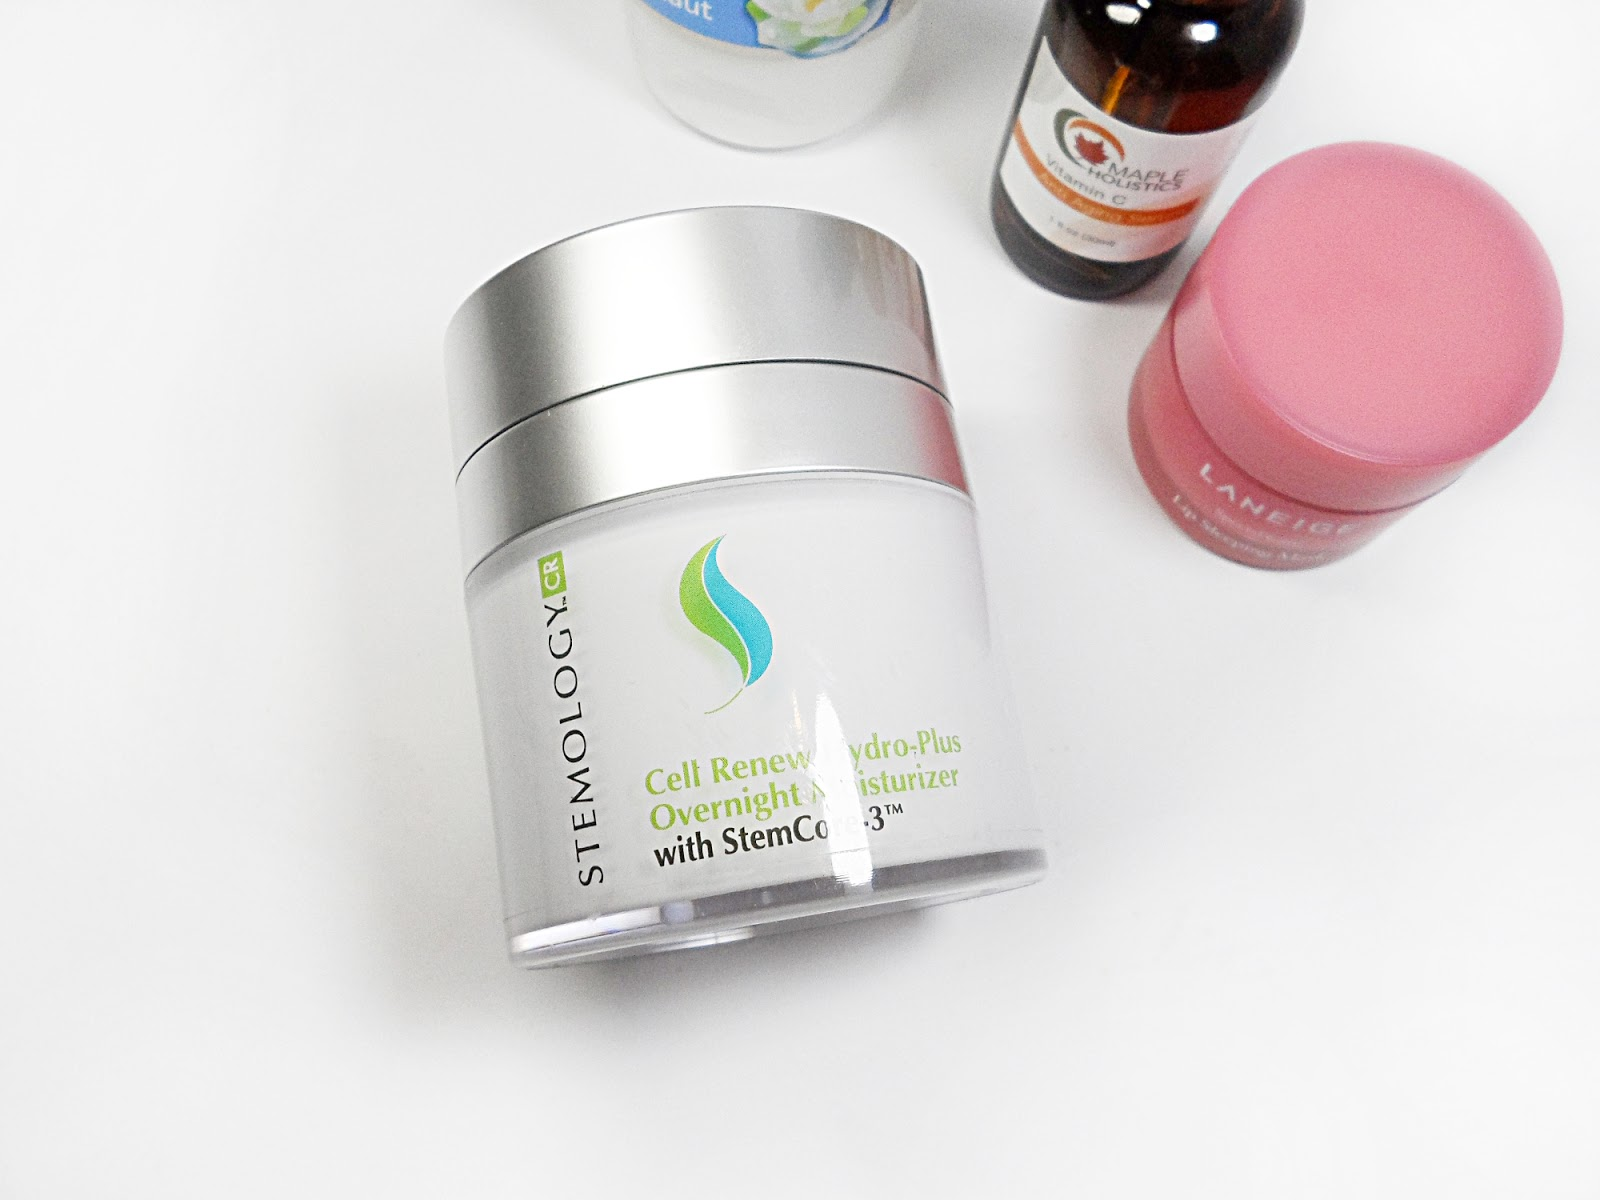 winter skin care blog for sensitive dry oily skin beauty products liz breygel